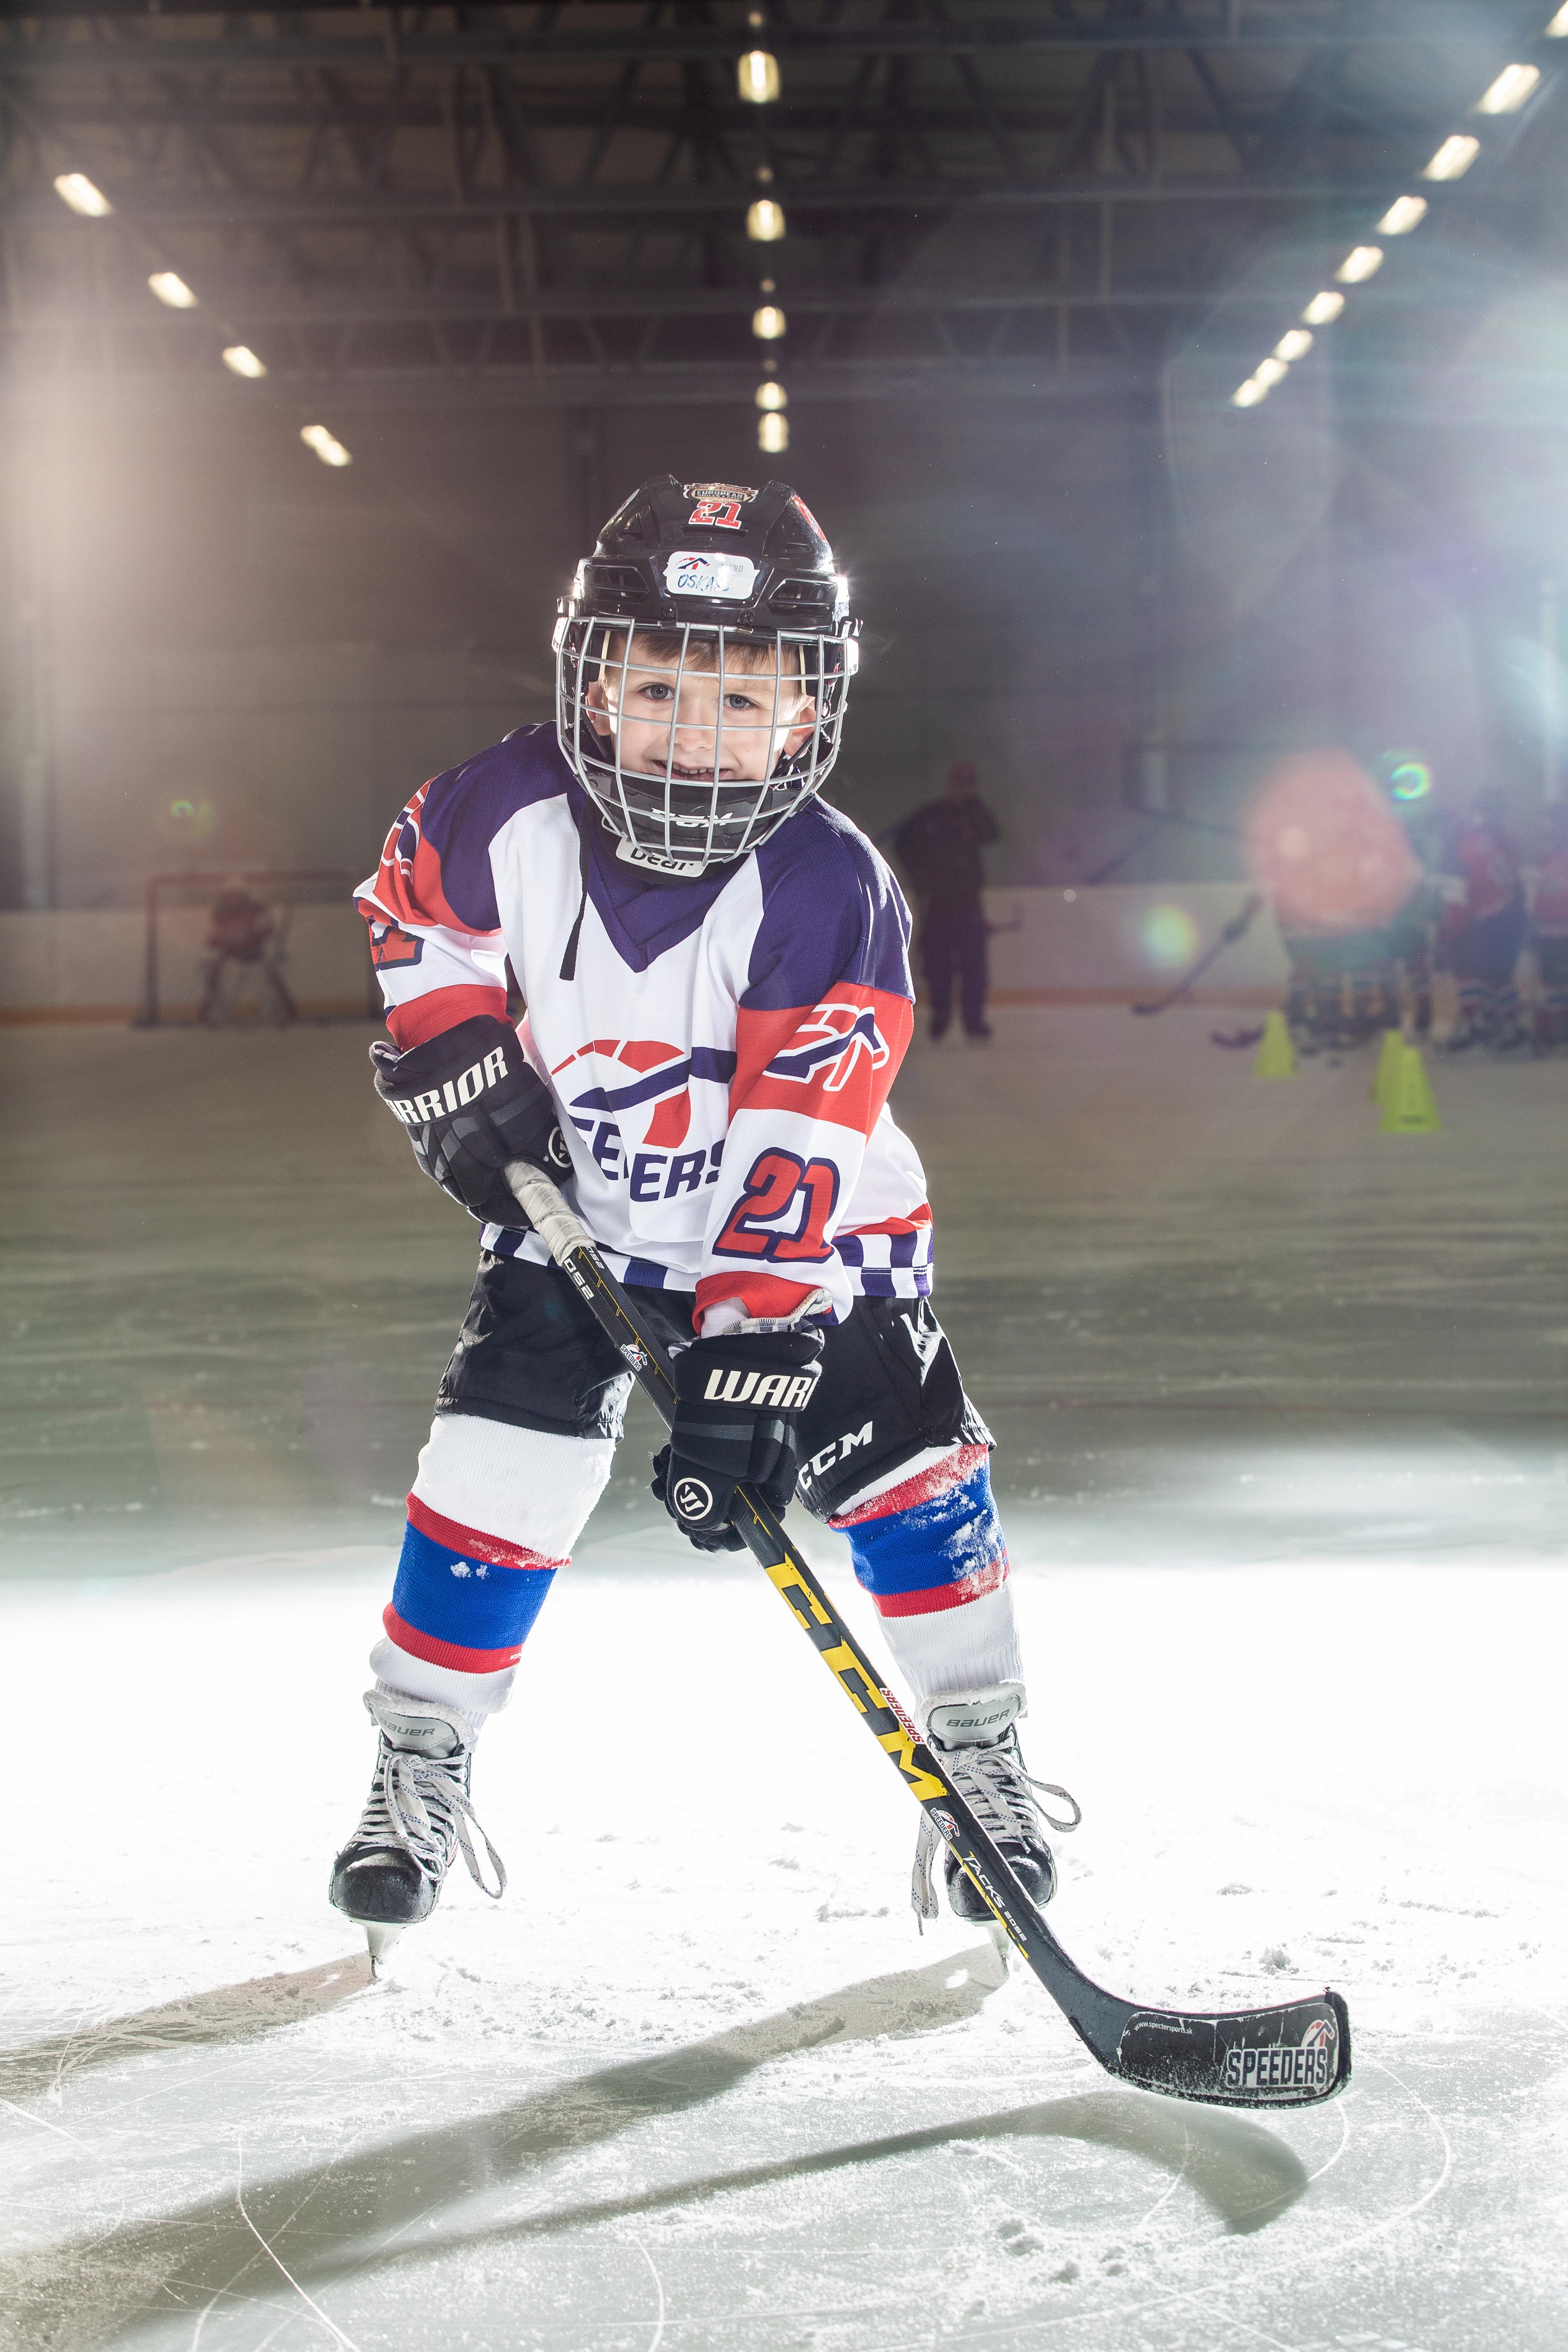 Oskar Jakub Ivanicko Speeders Bratislava cislo 21 hokej